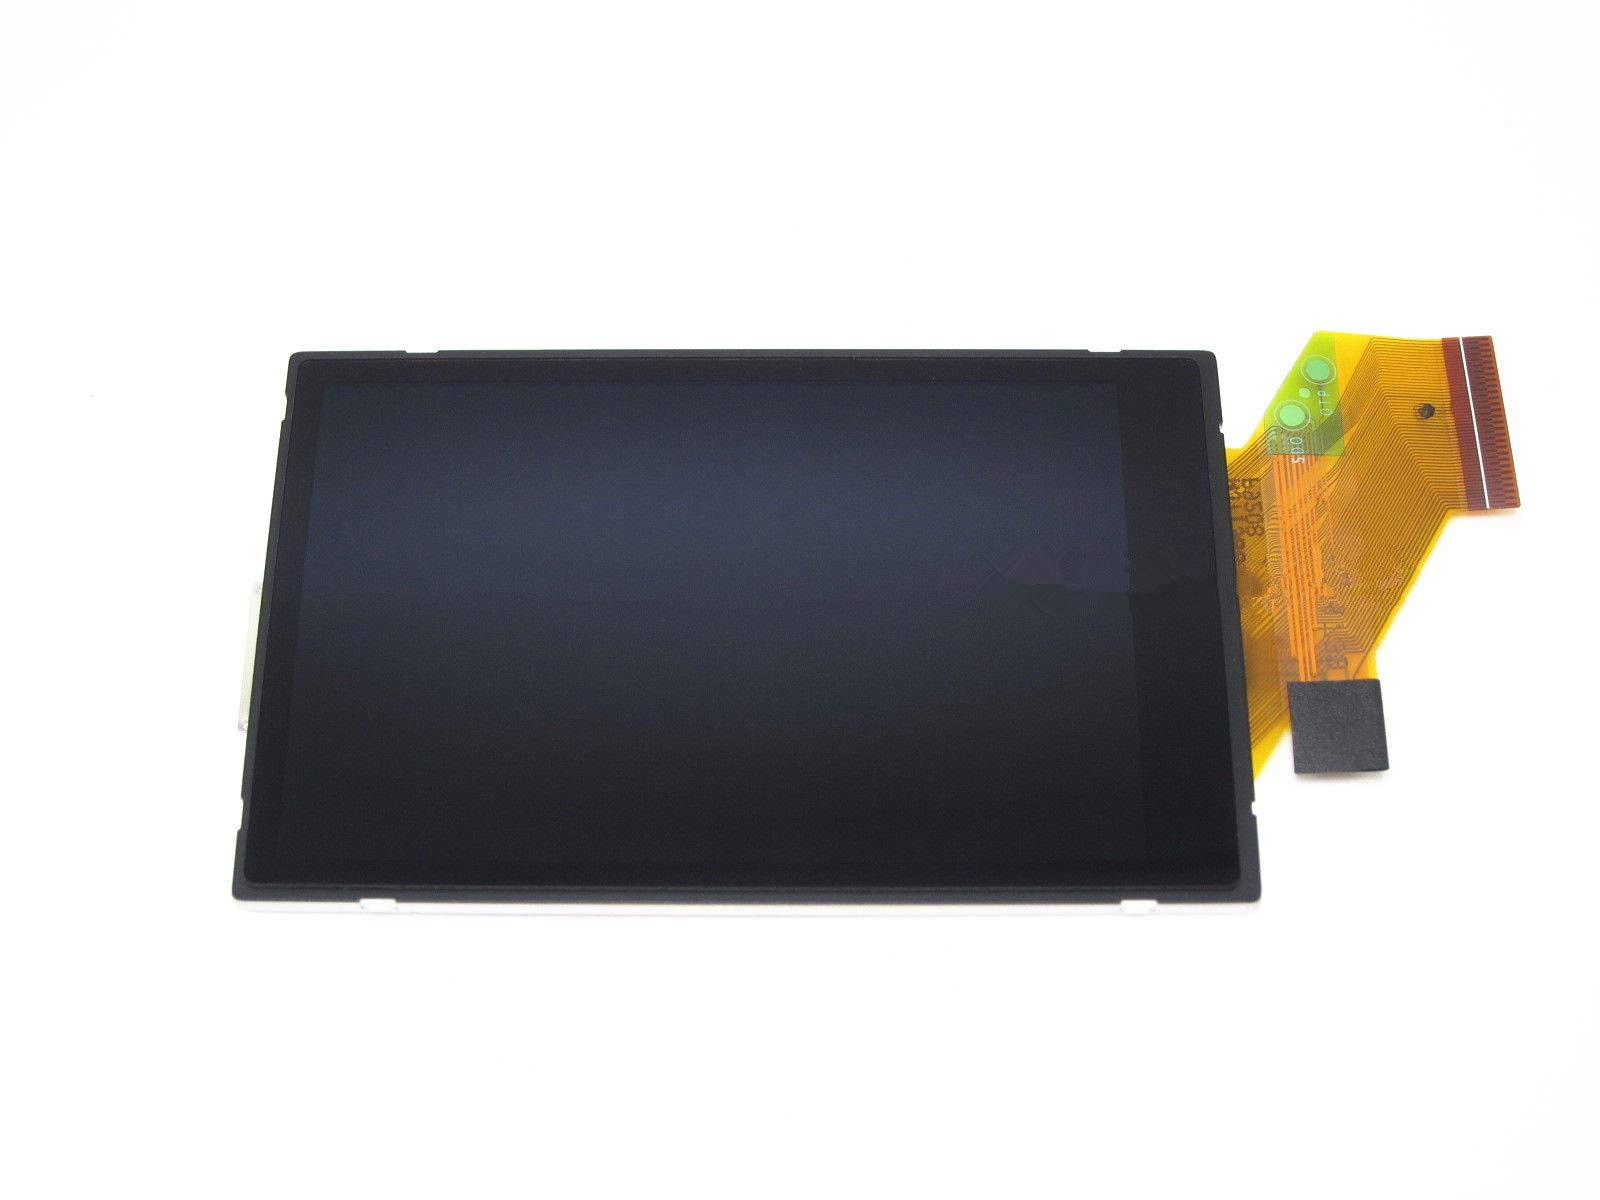 Replacement New LCD Display Screen L5BDDYY00153 for Panasonic Lumix TZ70 ZS50 DMC-TZ70 DMC-ZS50 by mEOZIADao (Image #1)